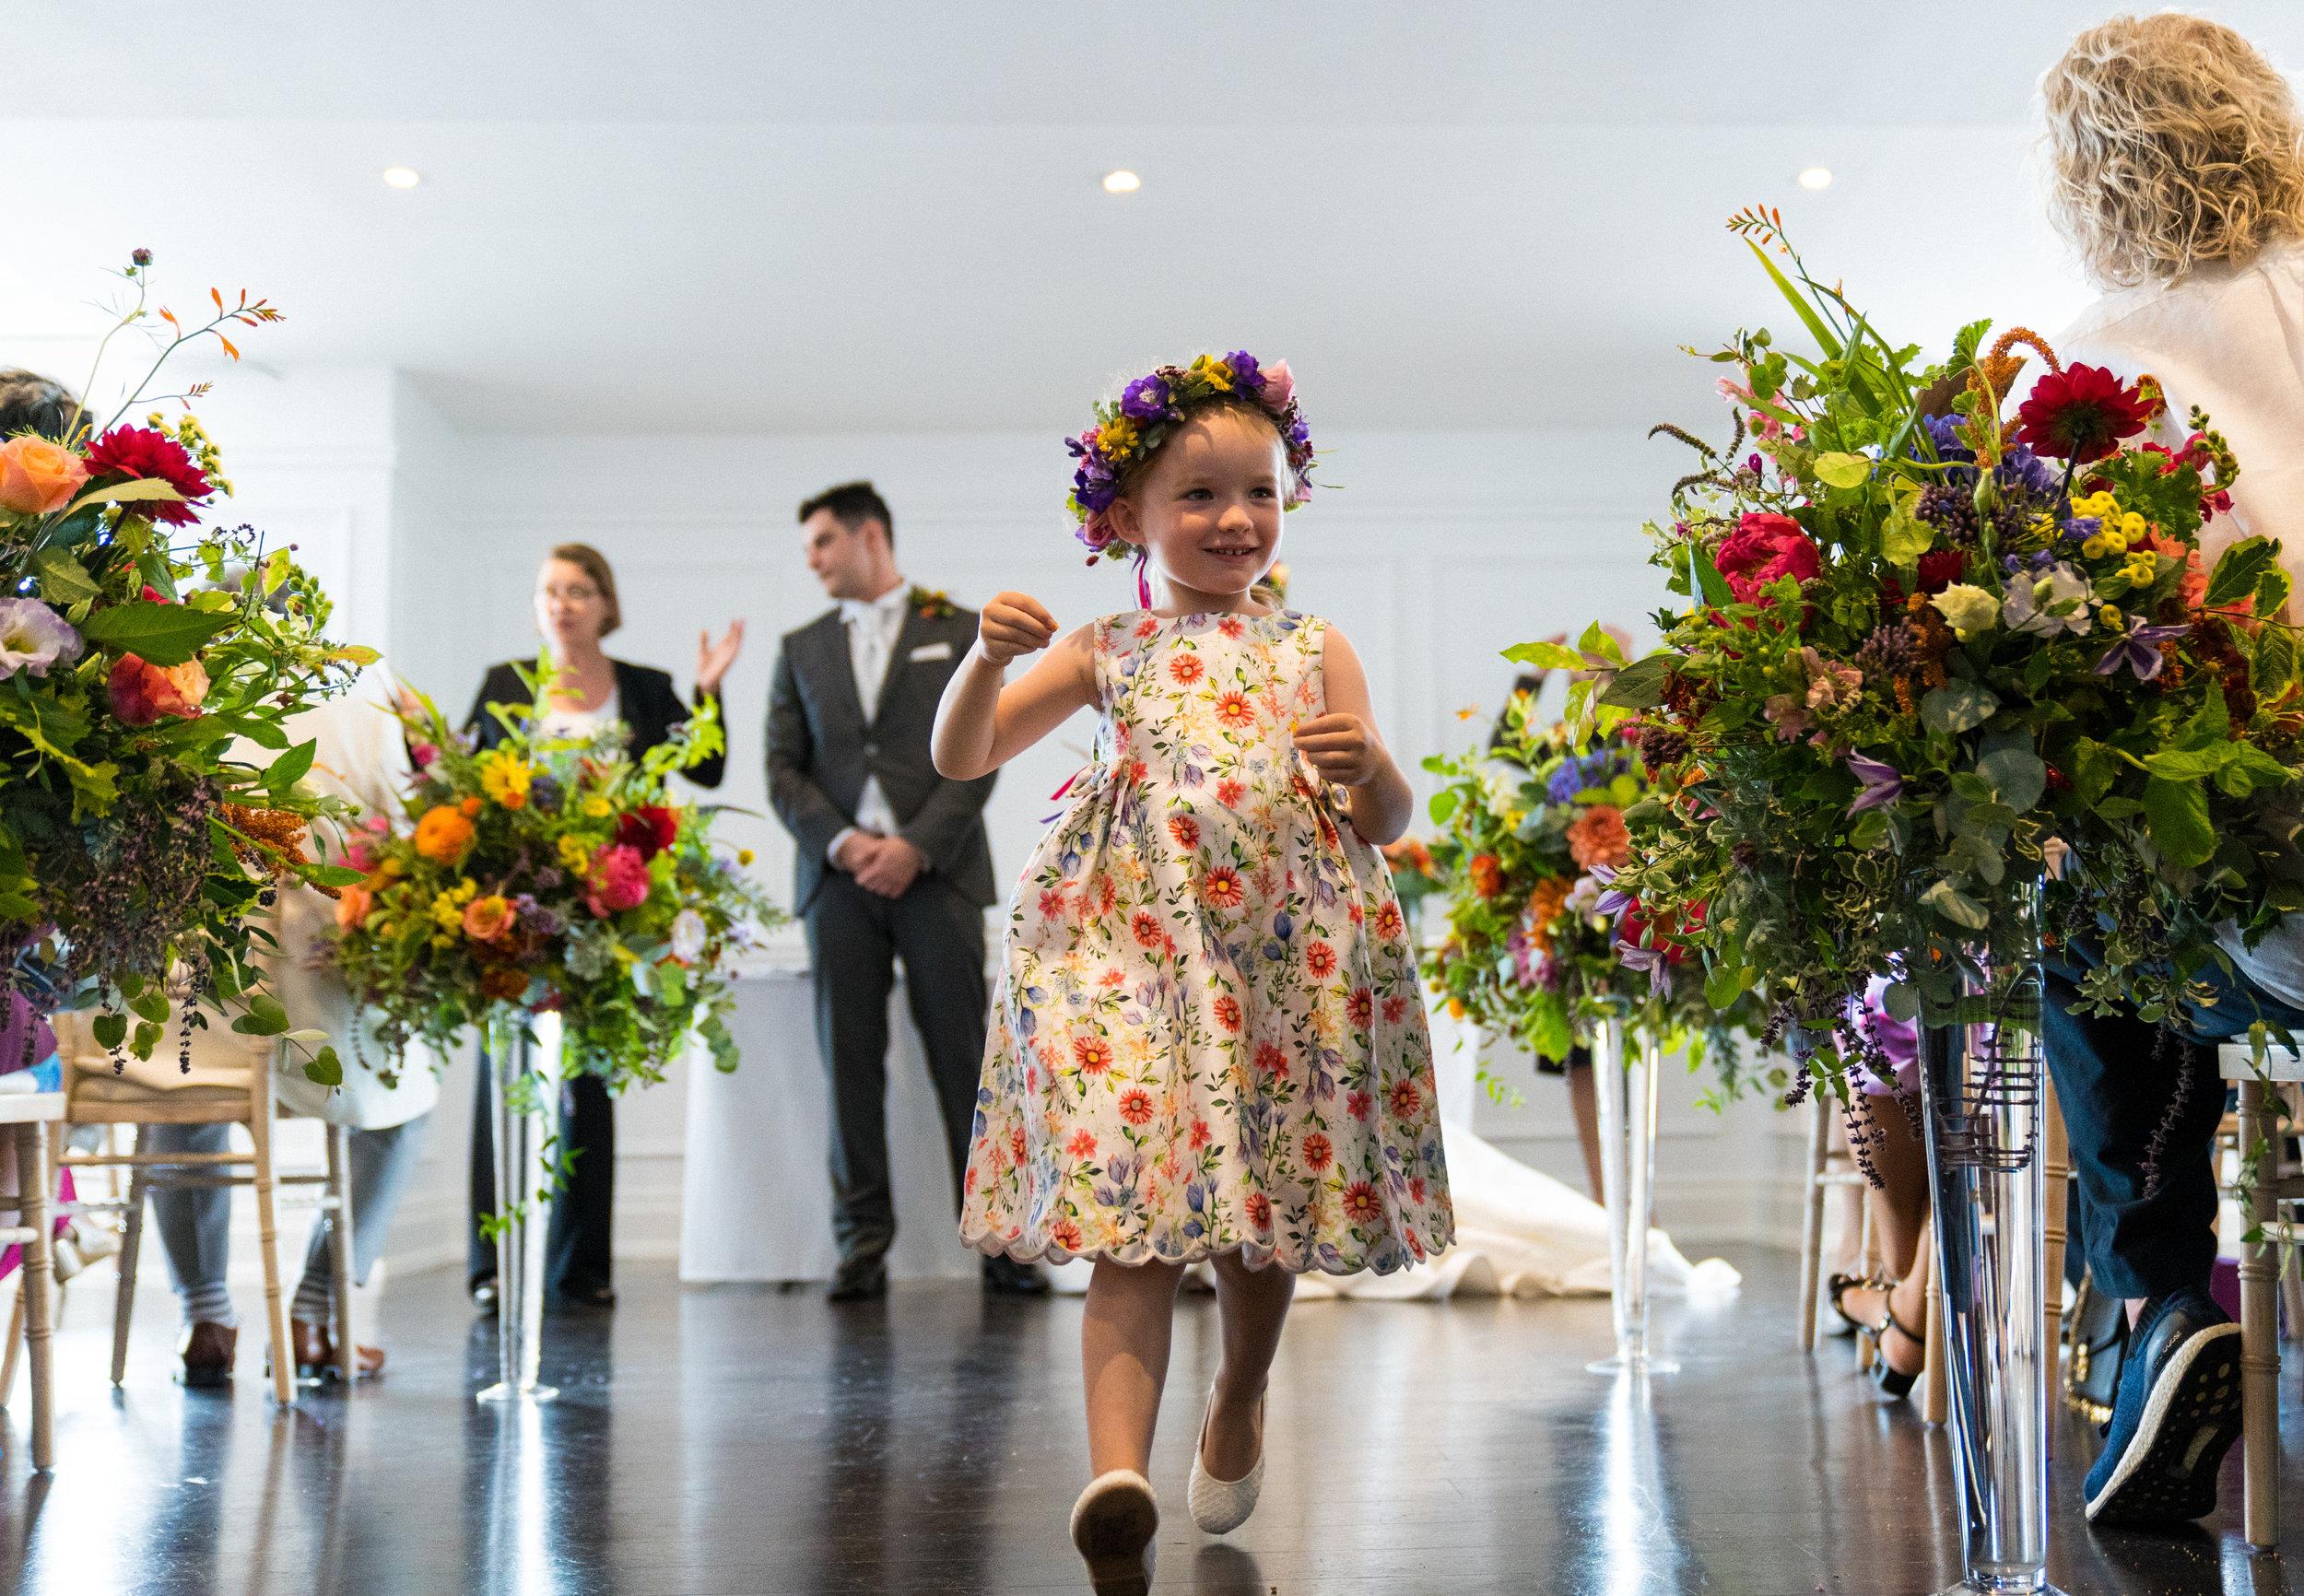 river-rooms-blackfriars-london-stpauls-mondrian-hotel-wedding-photography-videography-42